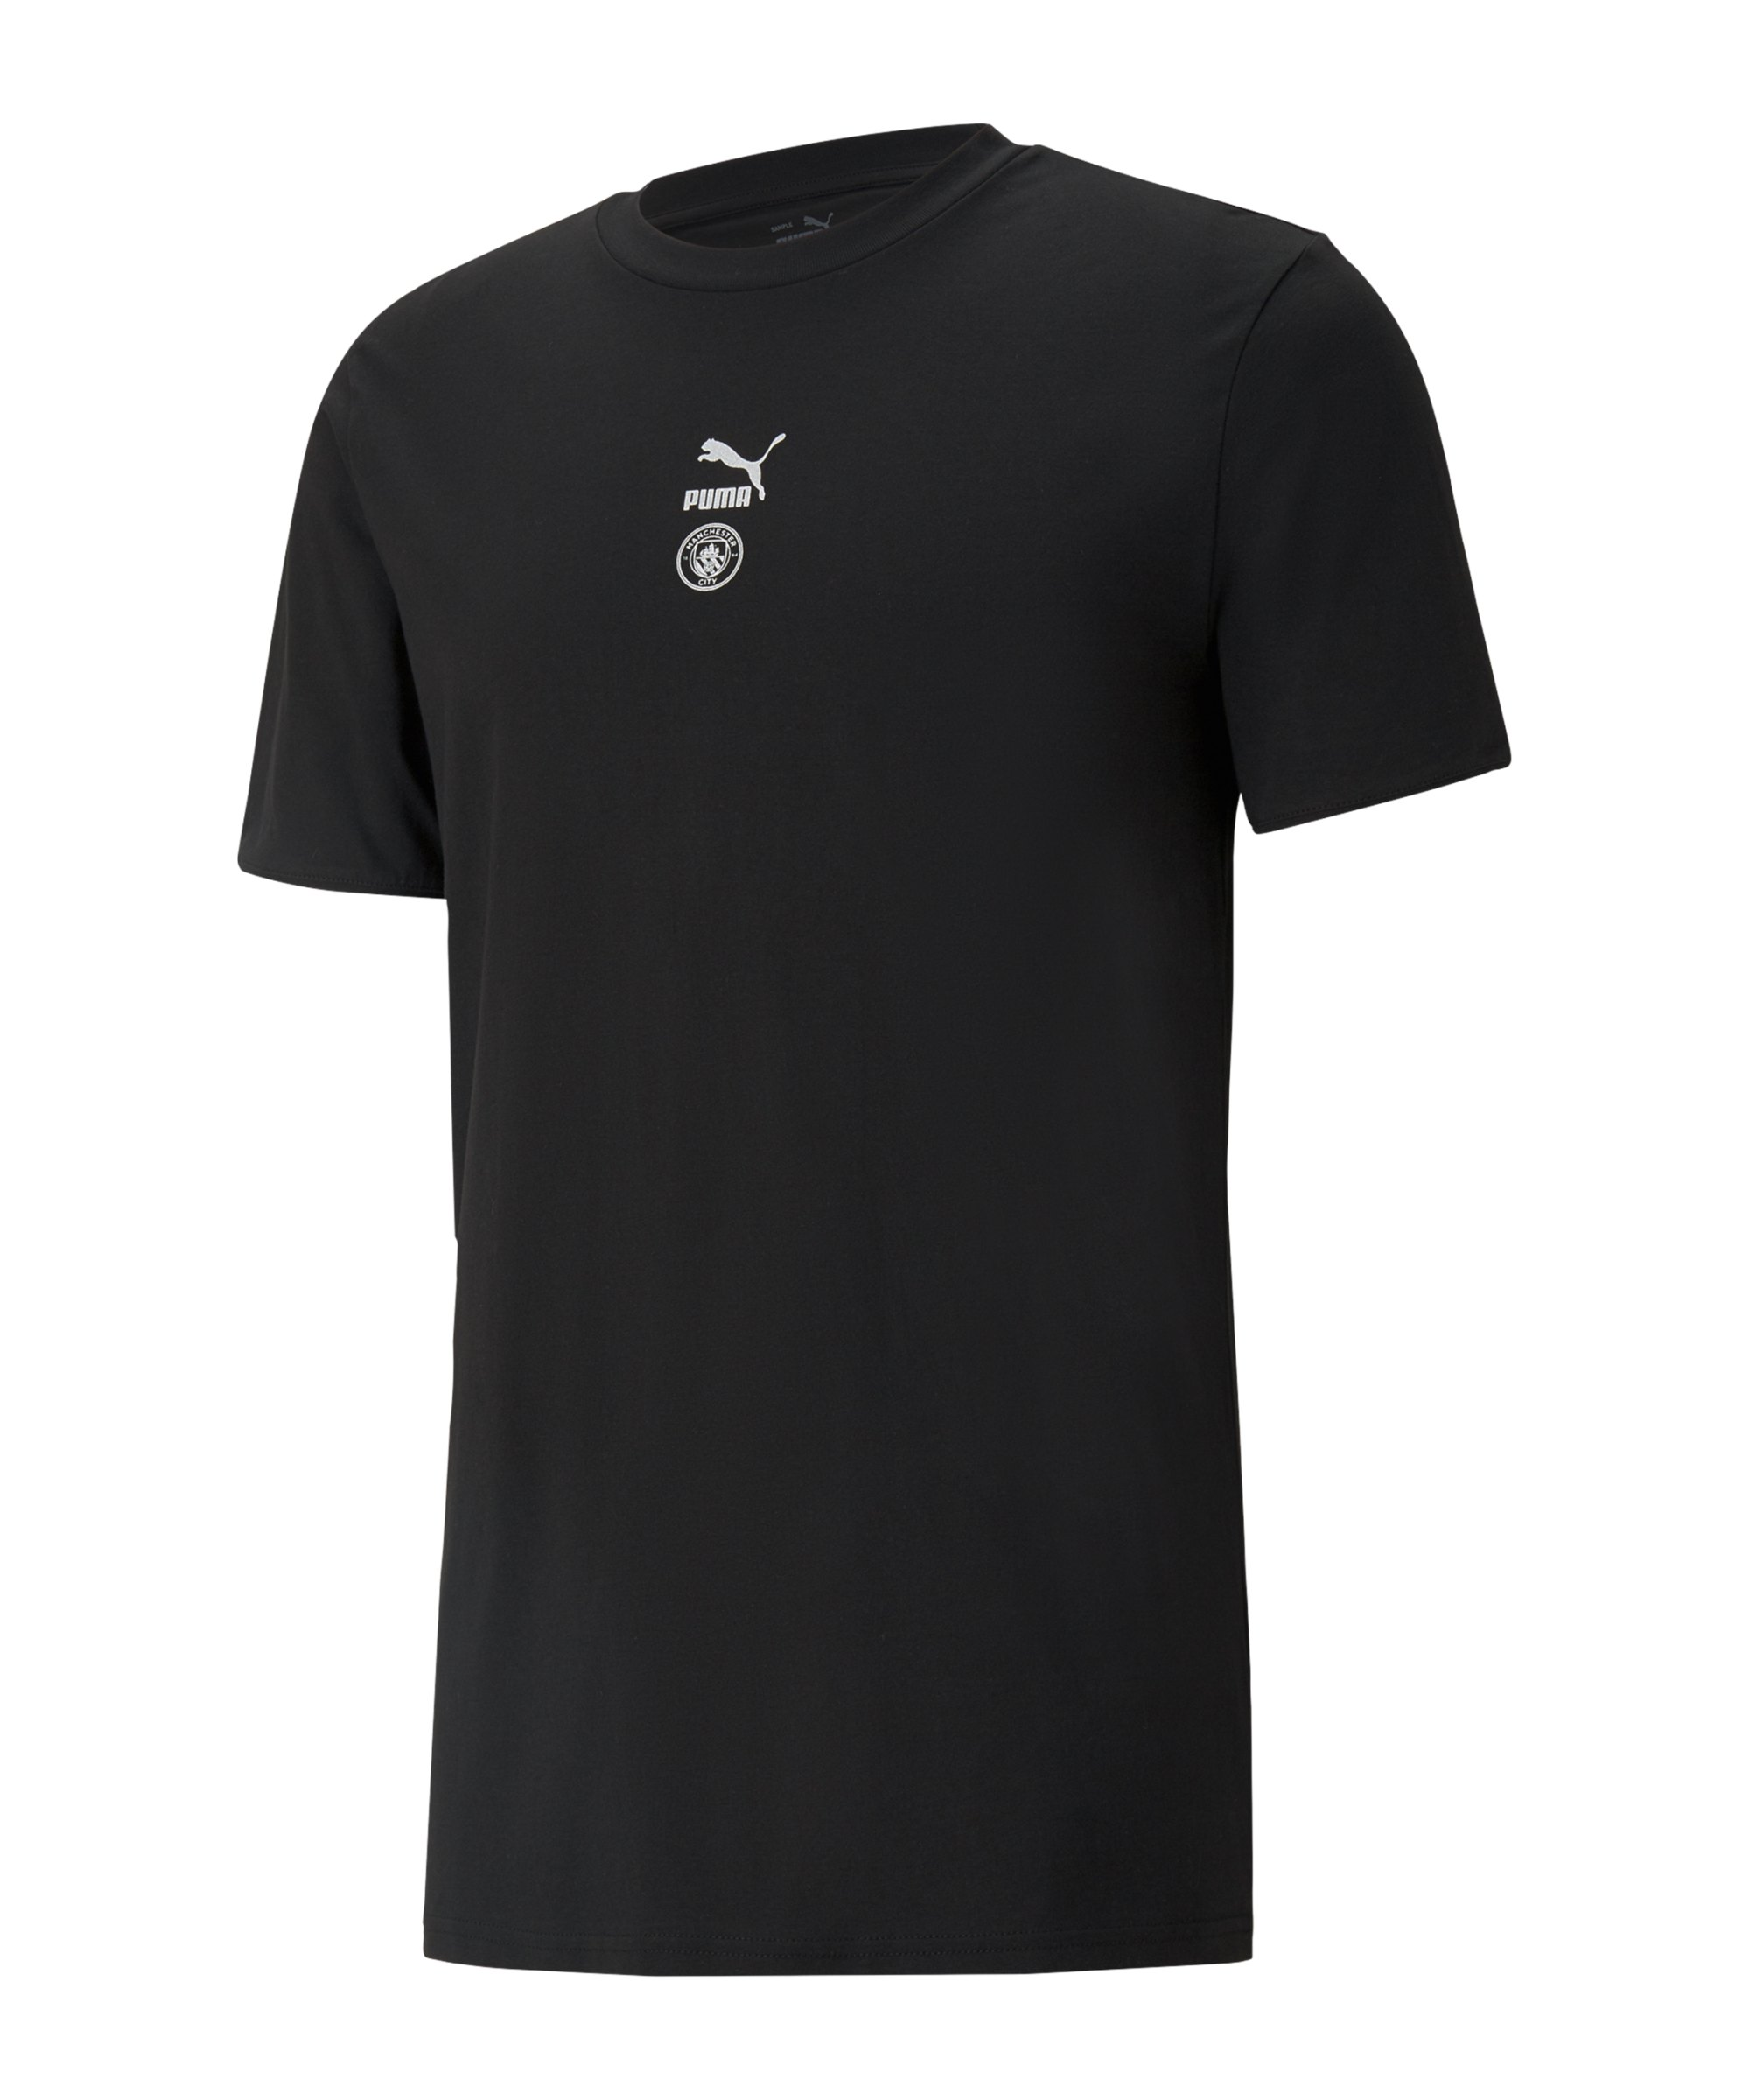 PUMA Manchester City TFS T-Shirt Schwarz F11 - schwarz